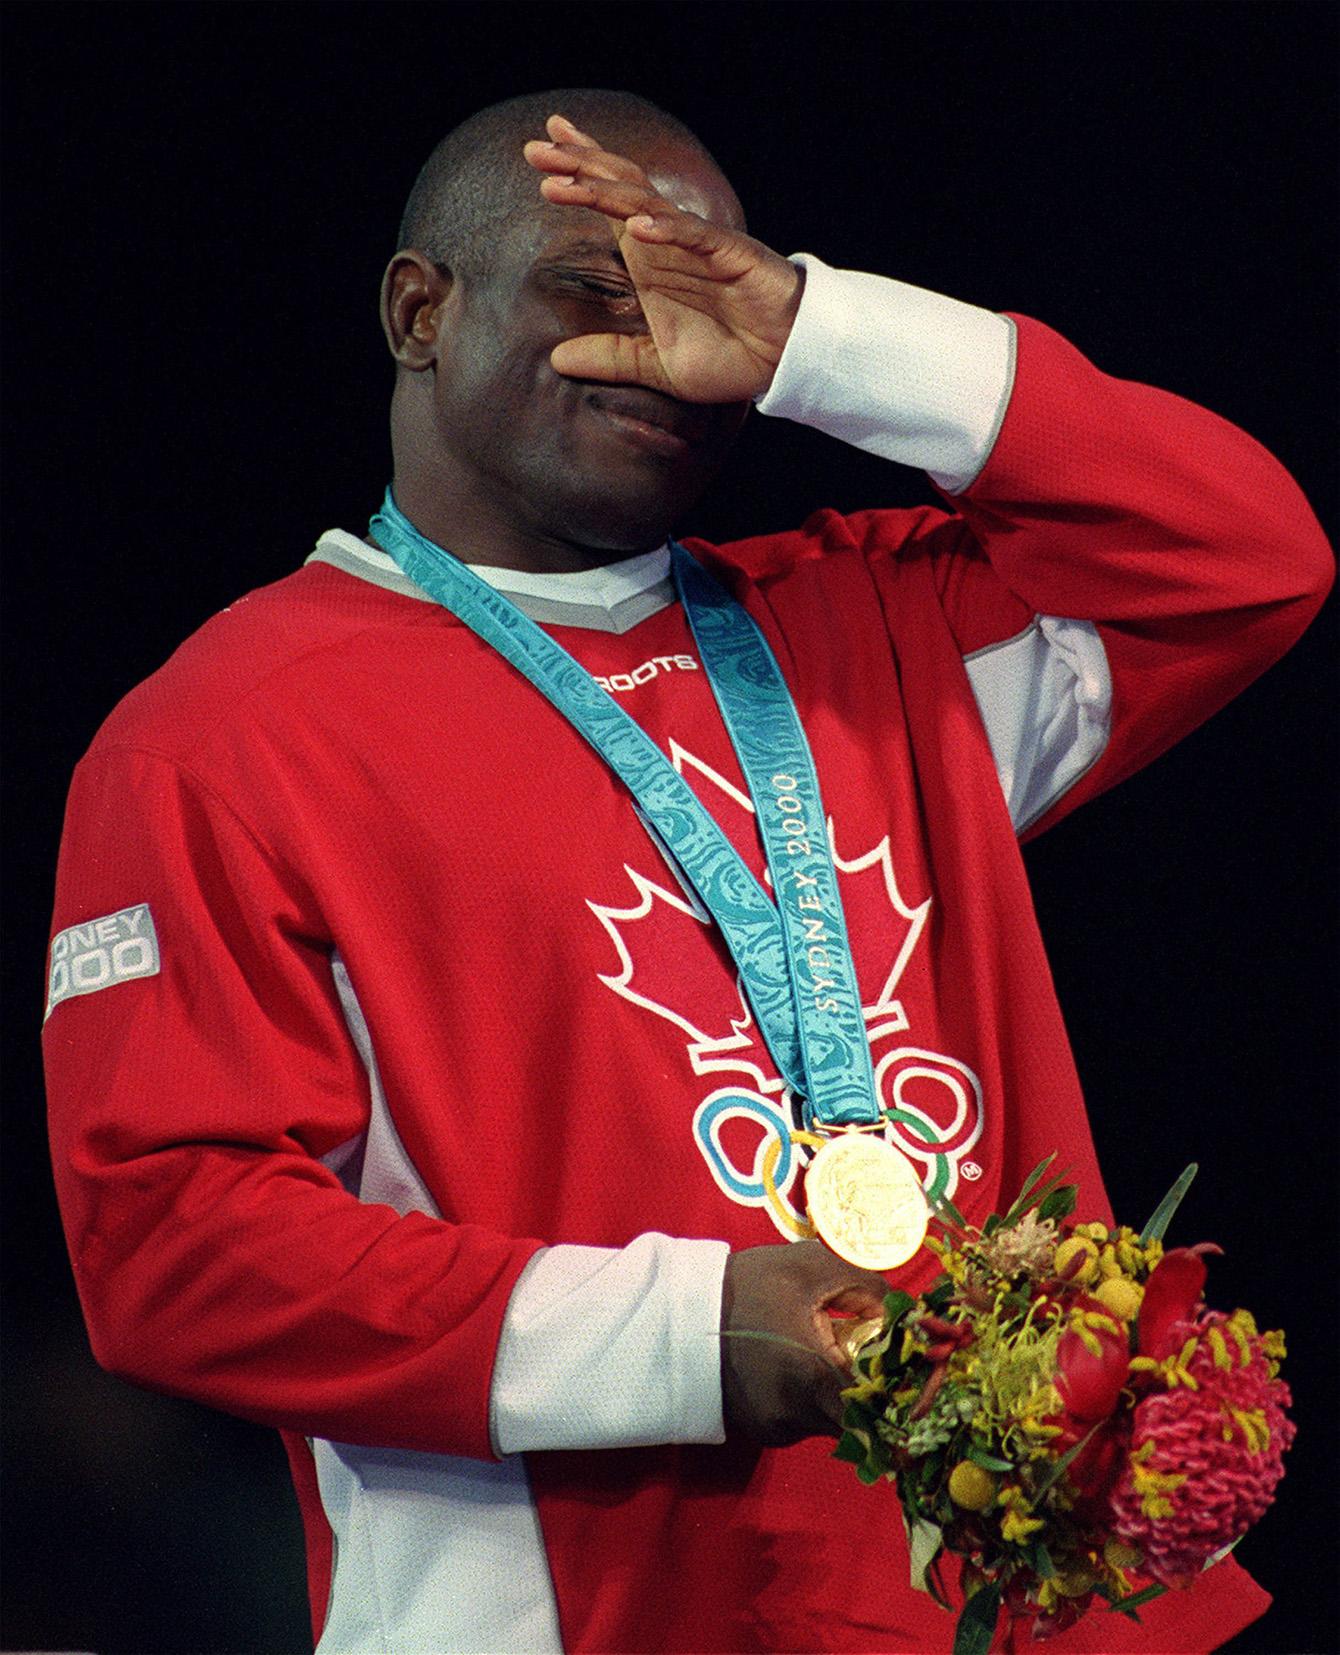 Igali wiping away tears on podium